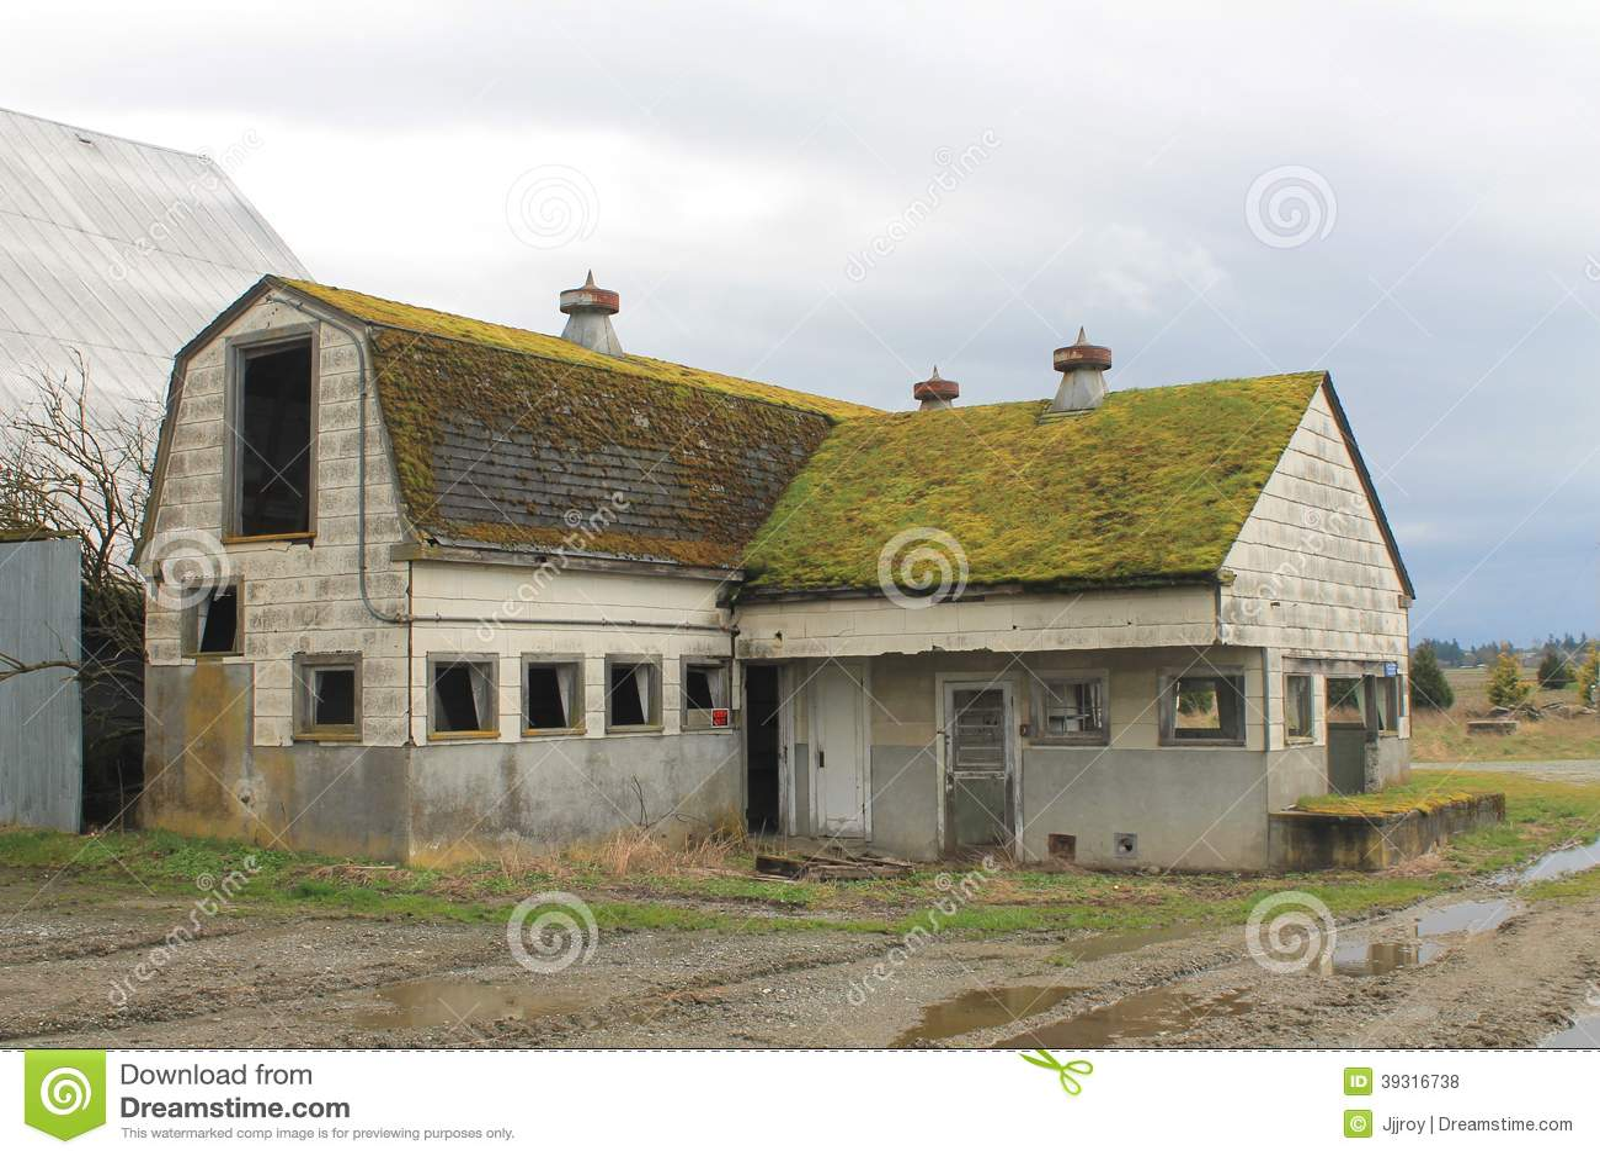 Abandoned Milk House And Dairy Barn Stock Photo Image